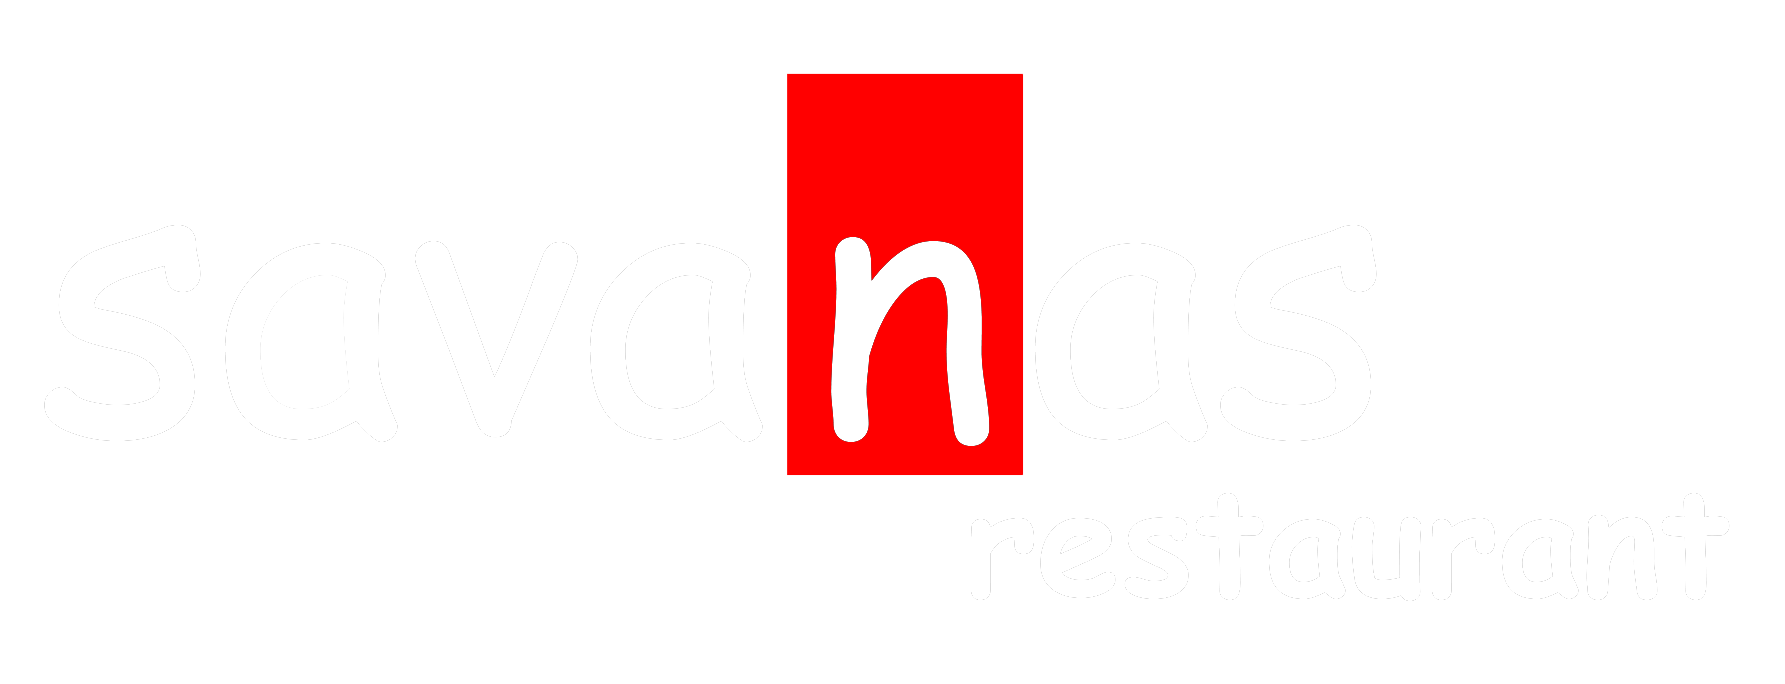 Savanas Restaurant